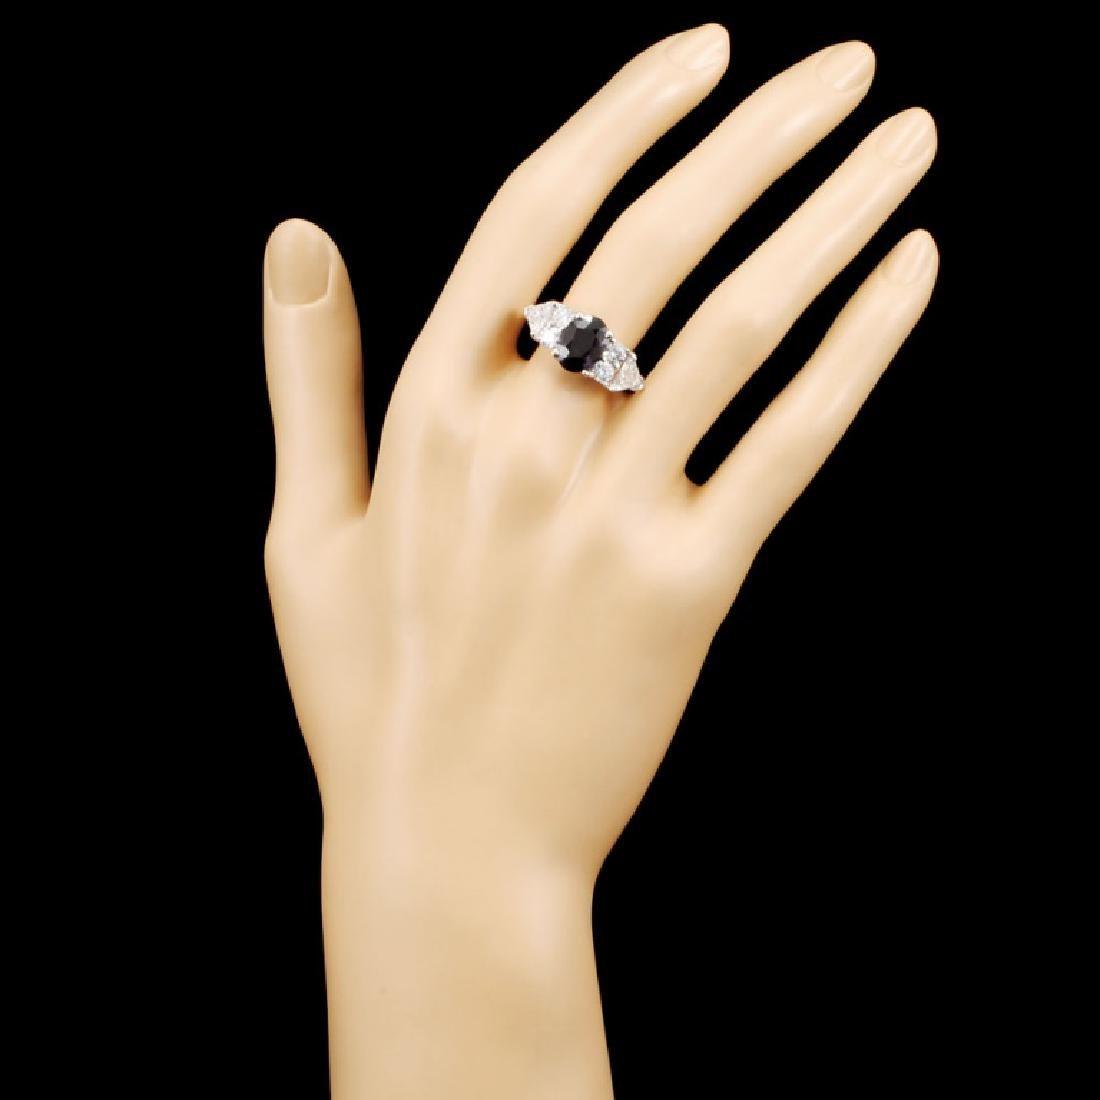 18K Gold 3.08ct Alexandrite & 2.16ctw Diamond Ring - 4